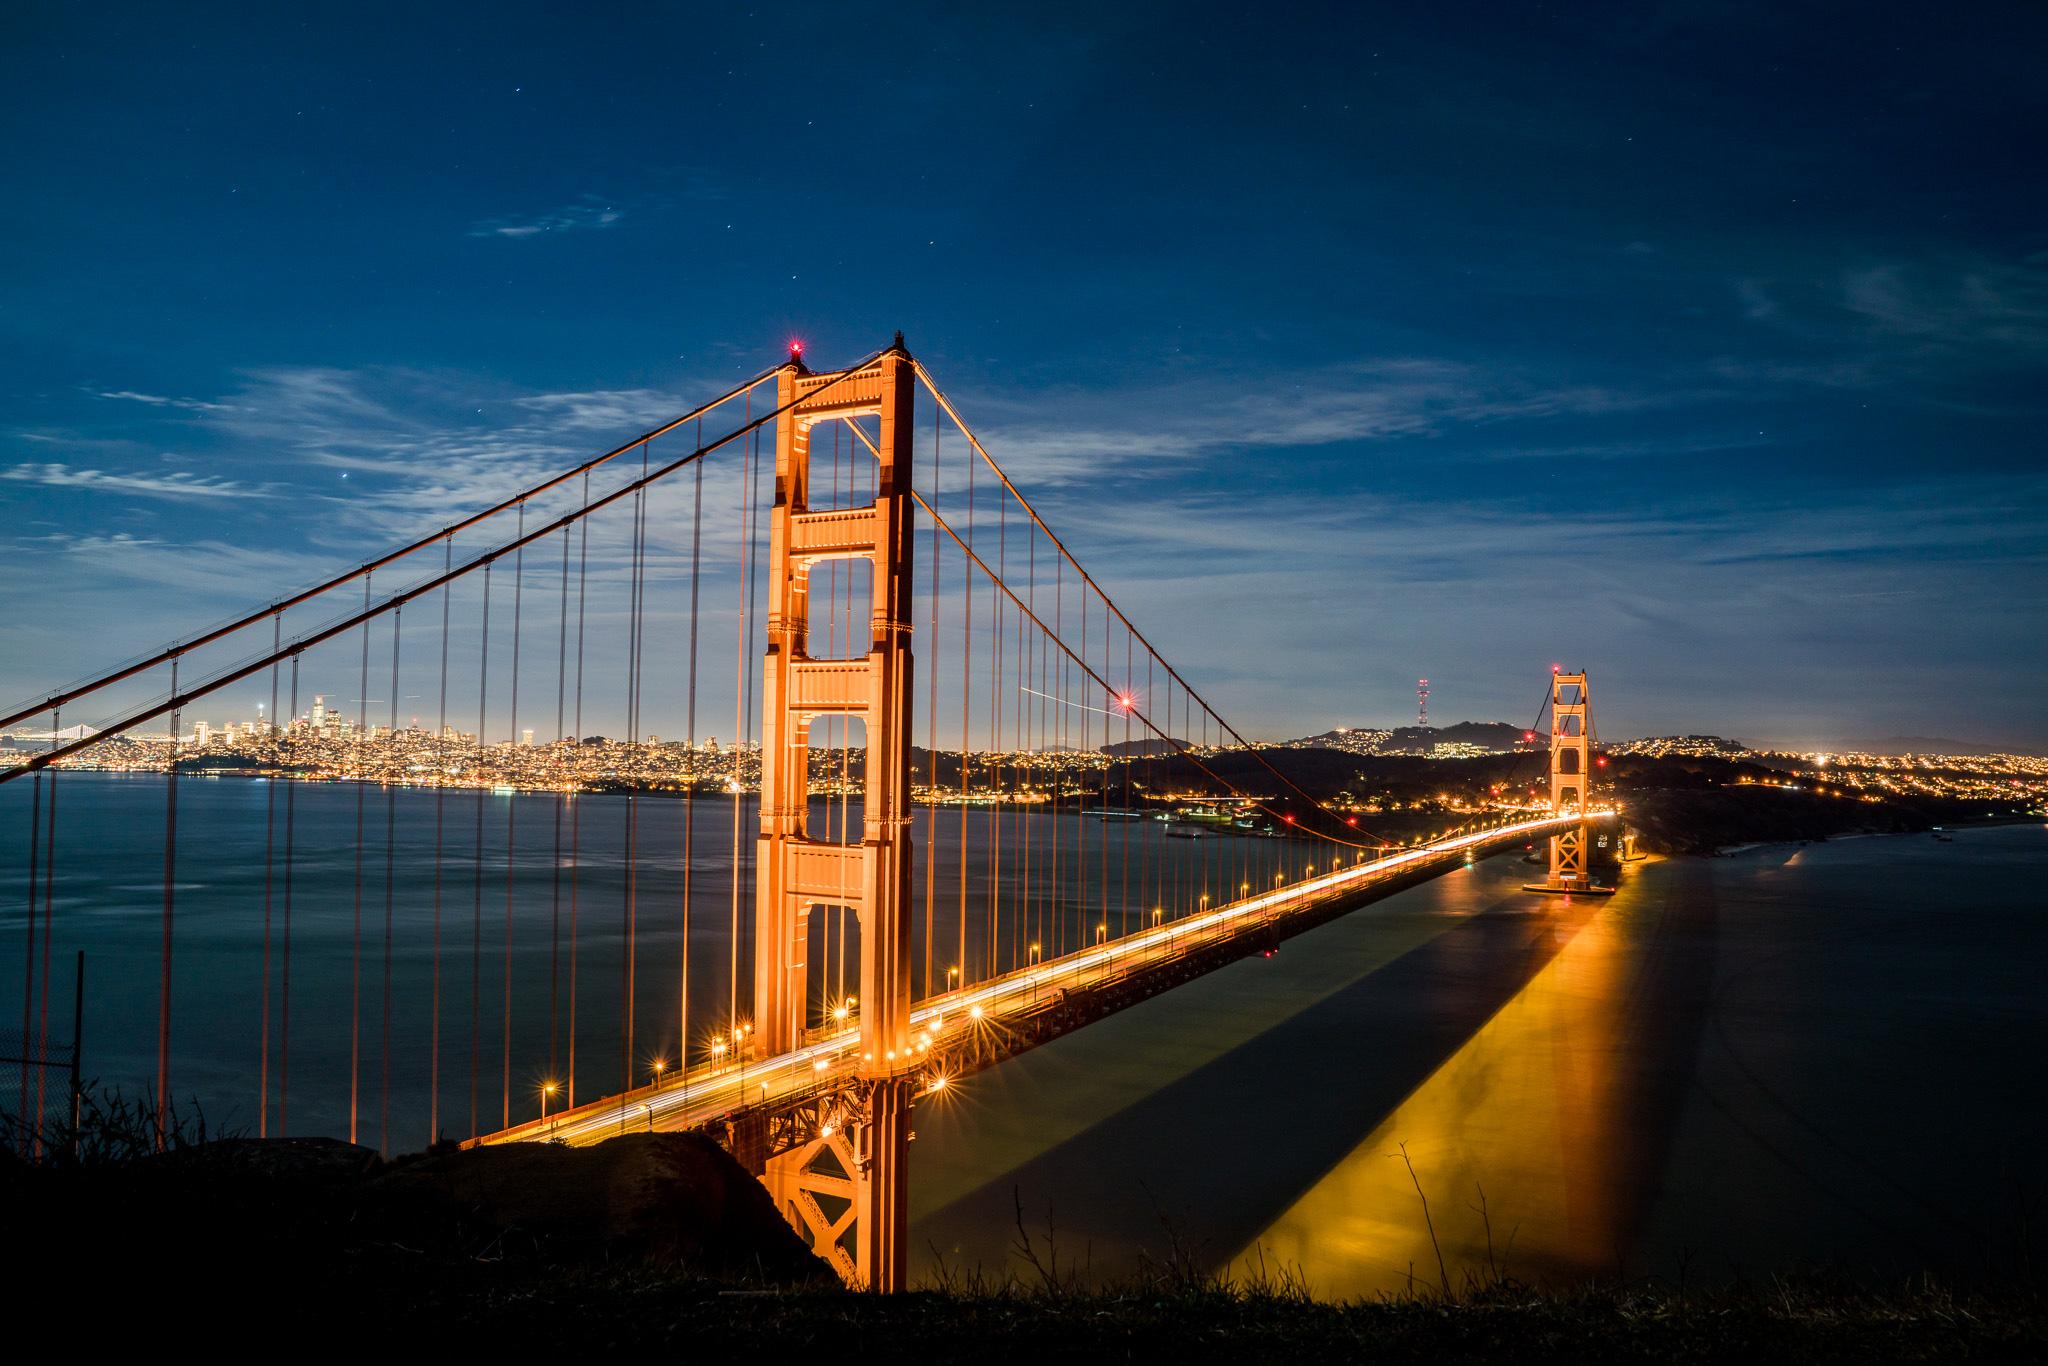 Golden Gate Bridge 4k: 2560x1440 Golden Gate Bridge 1440P Resolution HD 4k